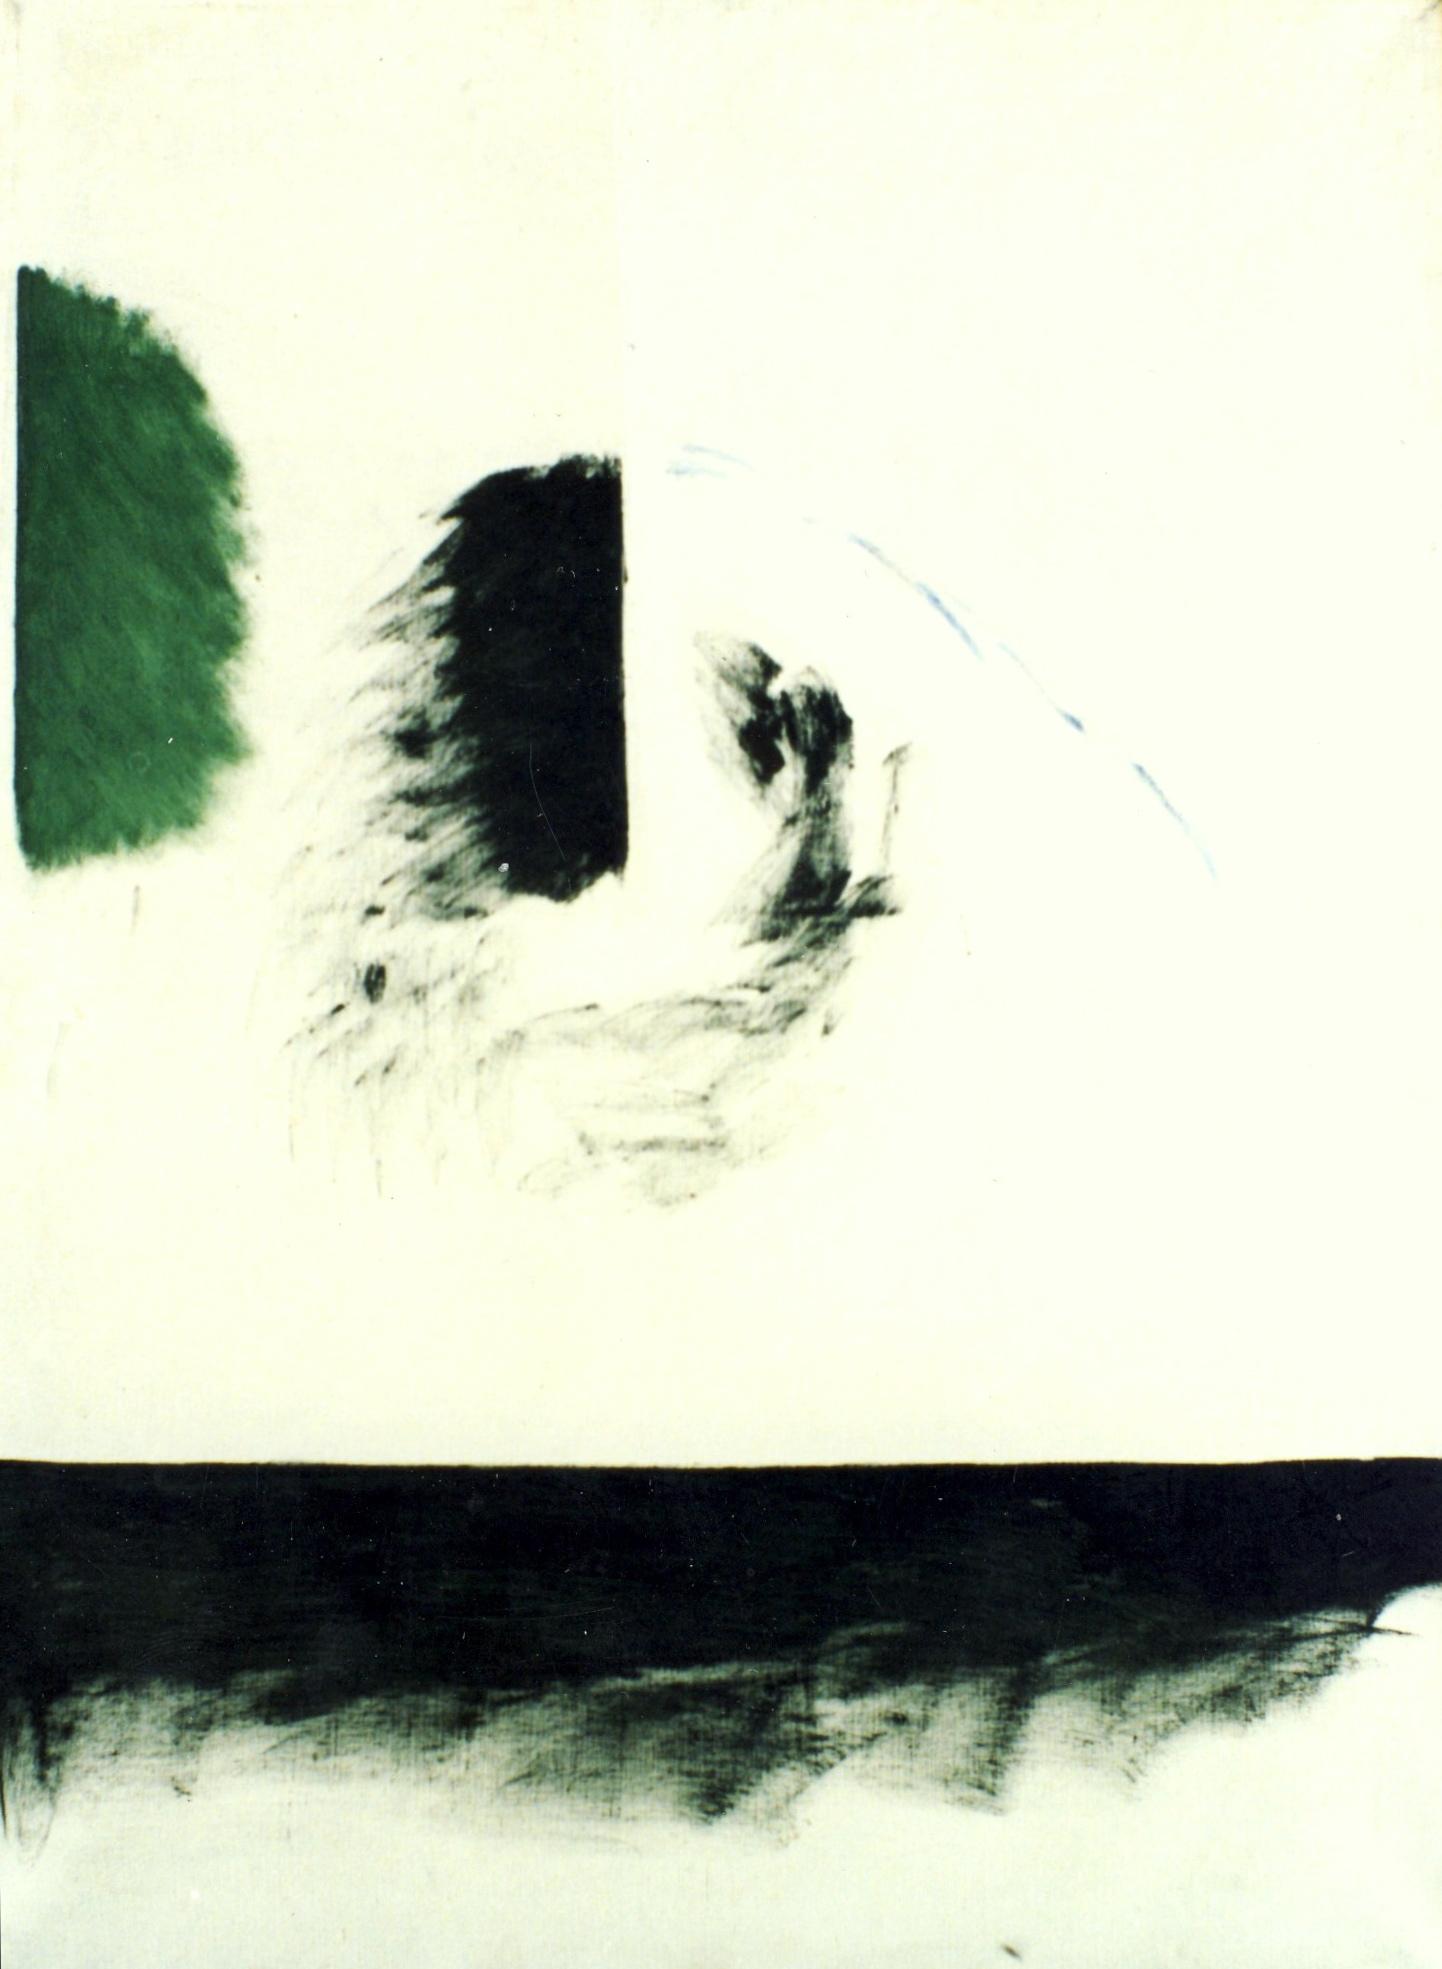 "senza titolo, dalla serie ""Ipotesi ultime"", 1963, olio su tela, cm 130 x 97  untitled, from the series ""Ipotesi ultime"", 1963, oil on canvas, cm 130 x 97"